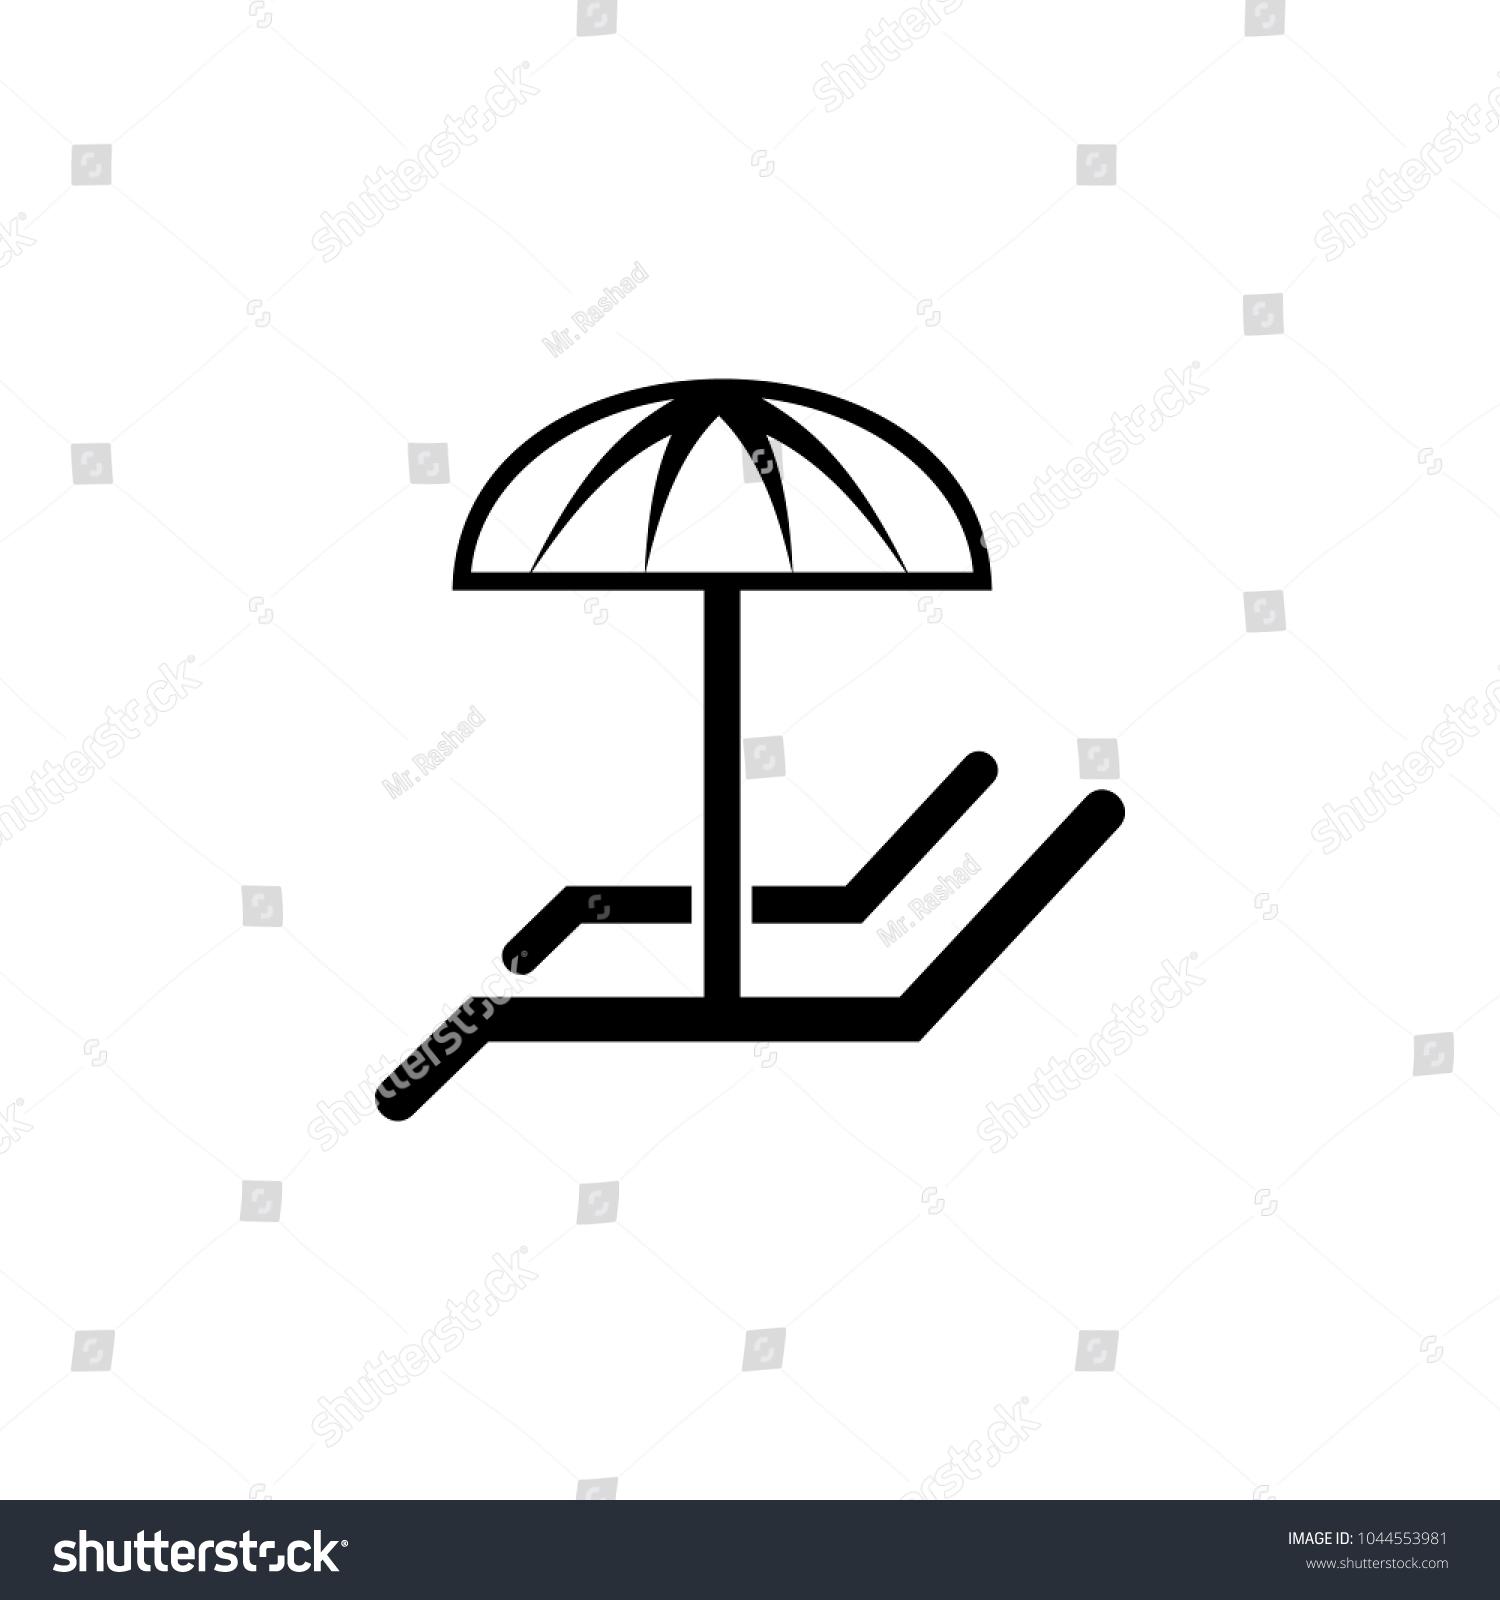 Loungers umbrella icon element spa icon stock vector 1044553981 element of spa icon premium quality graphic design signs buycottarizona Choice Image